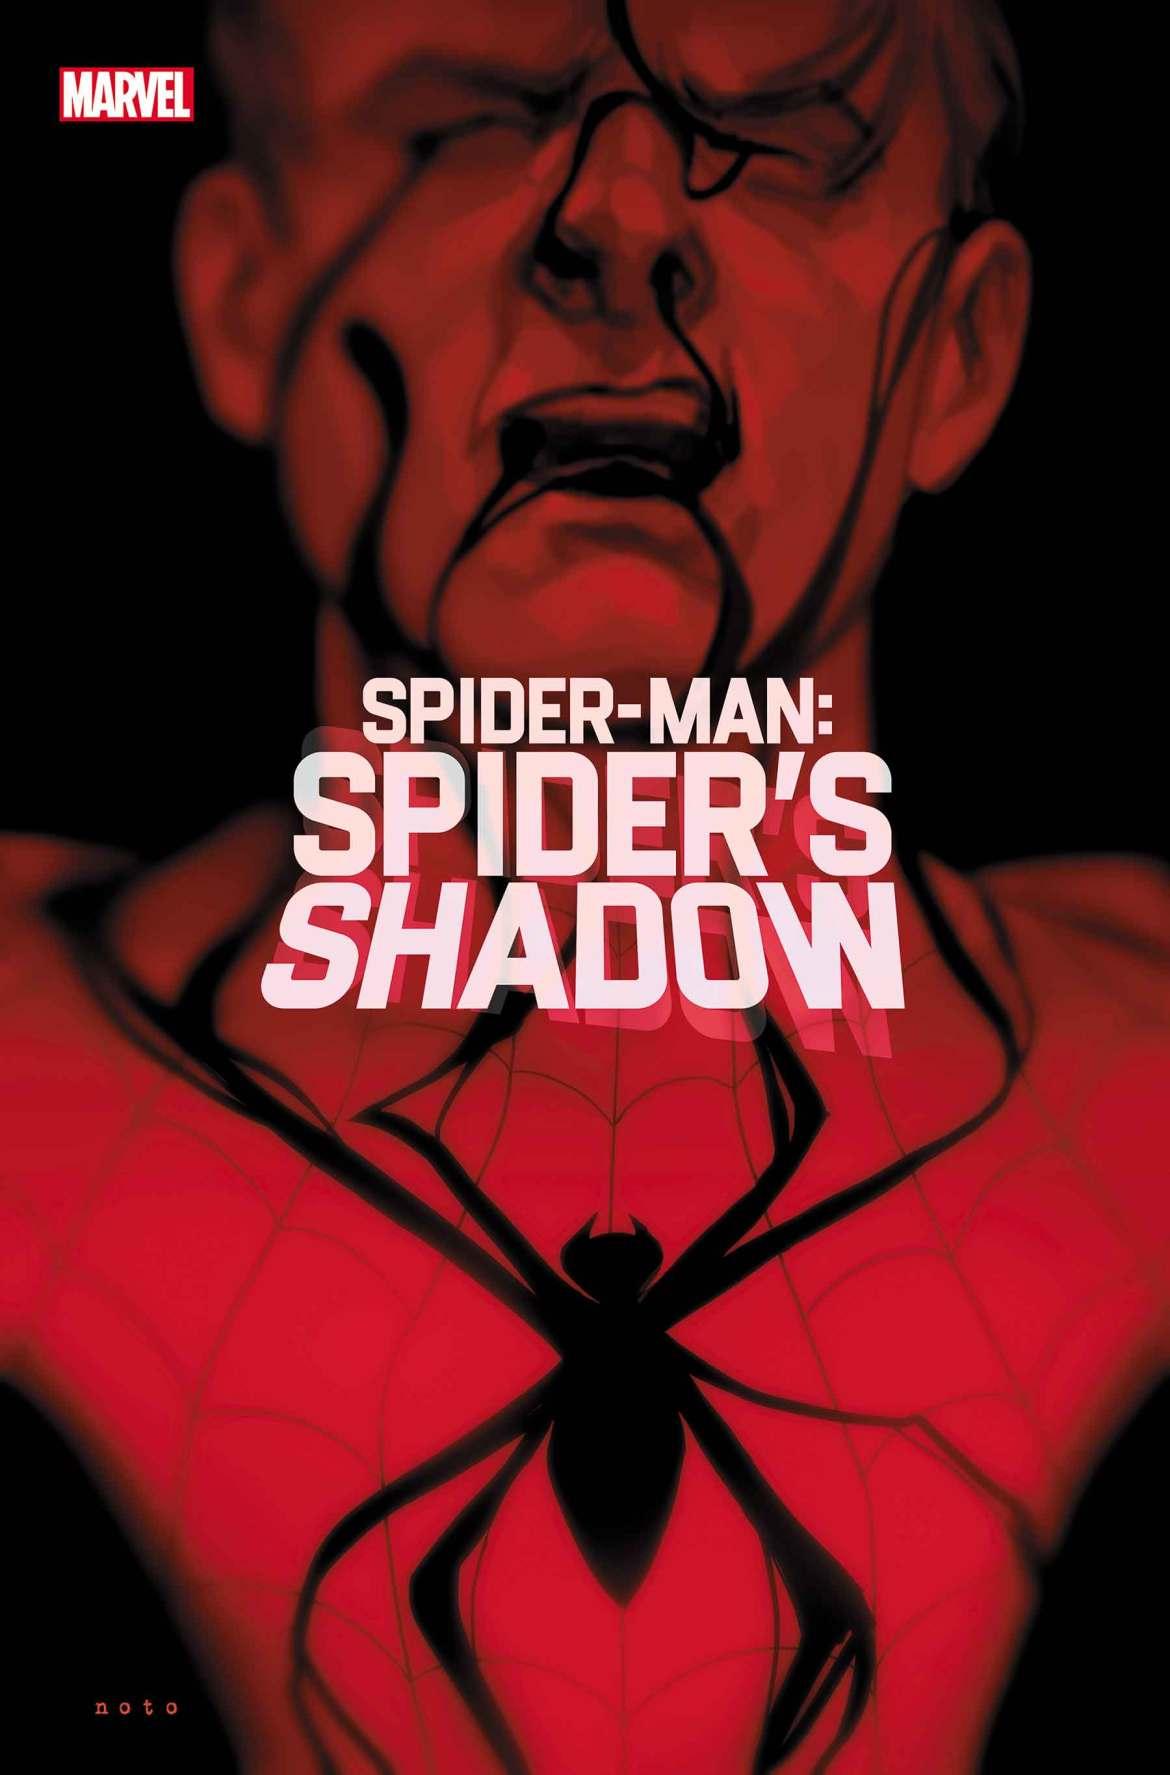 SMSPIDERSHADOW2021001_cov Peter Parker embraces the dark in SPIDER-MAN: SPIDER'S SHADOW